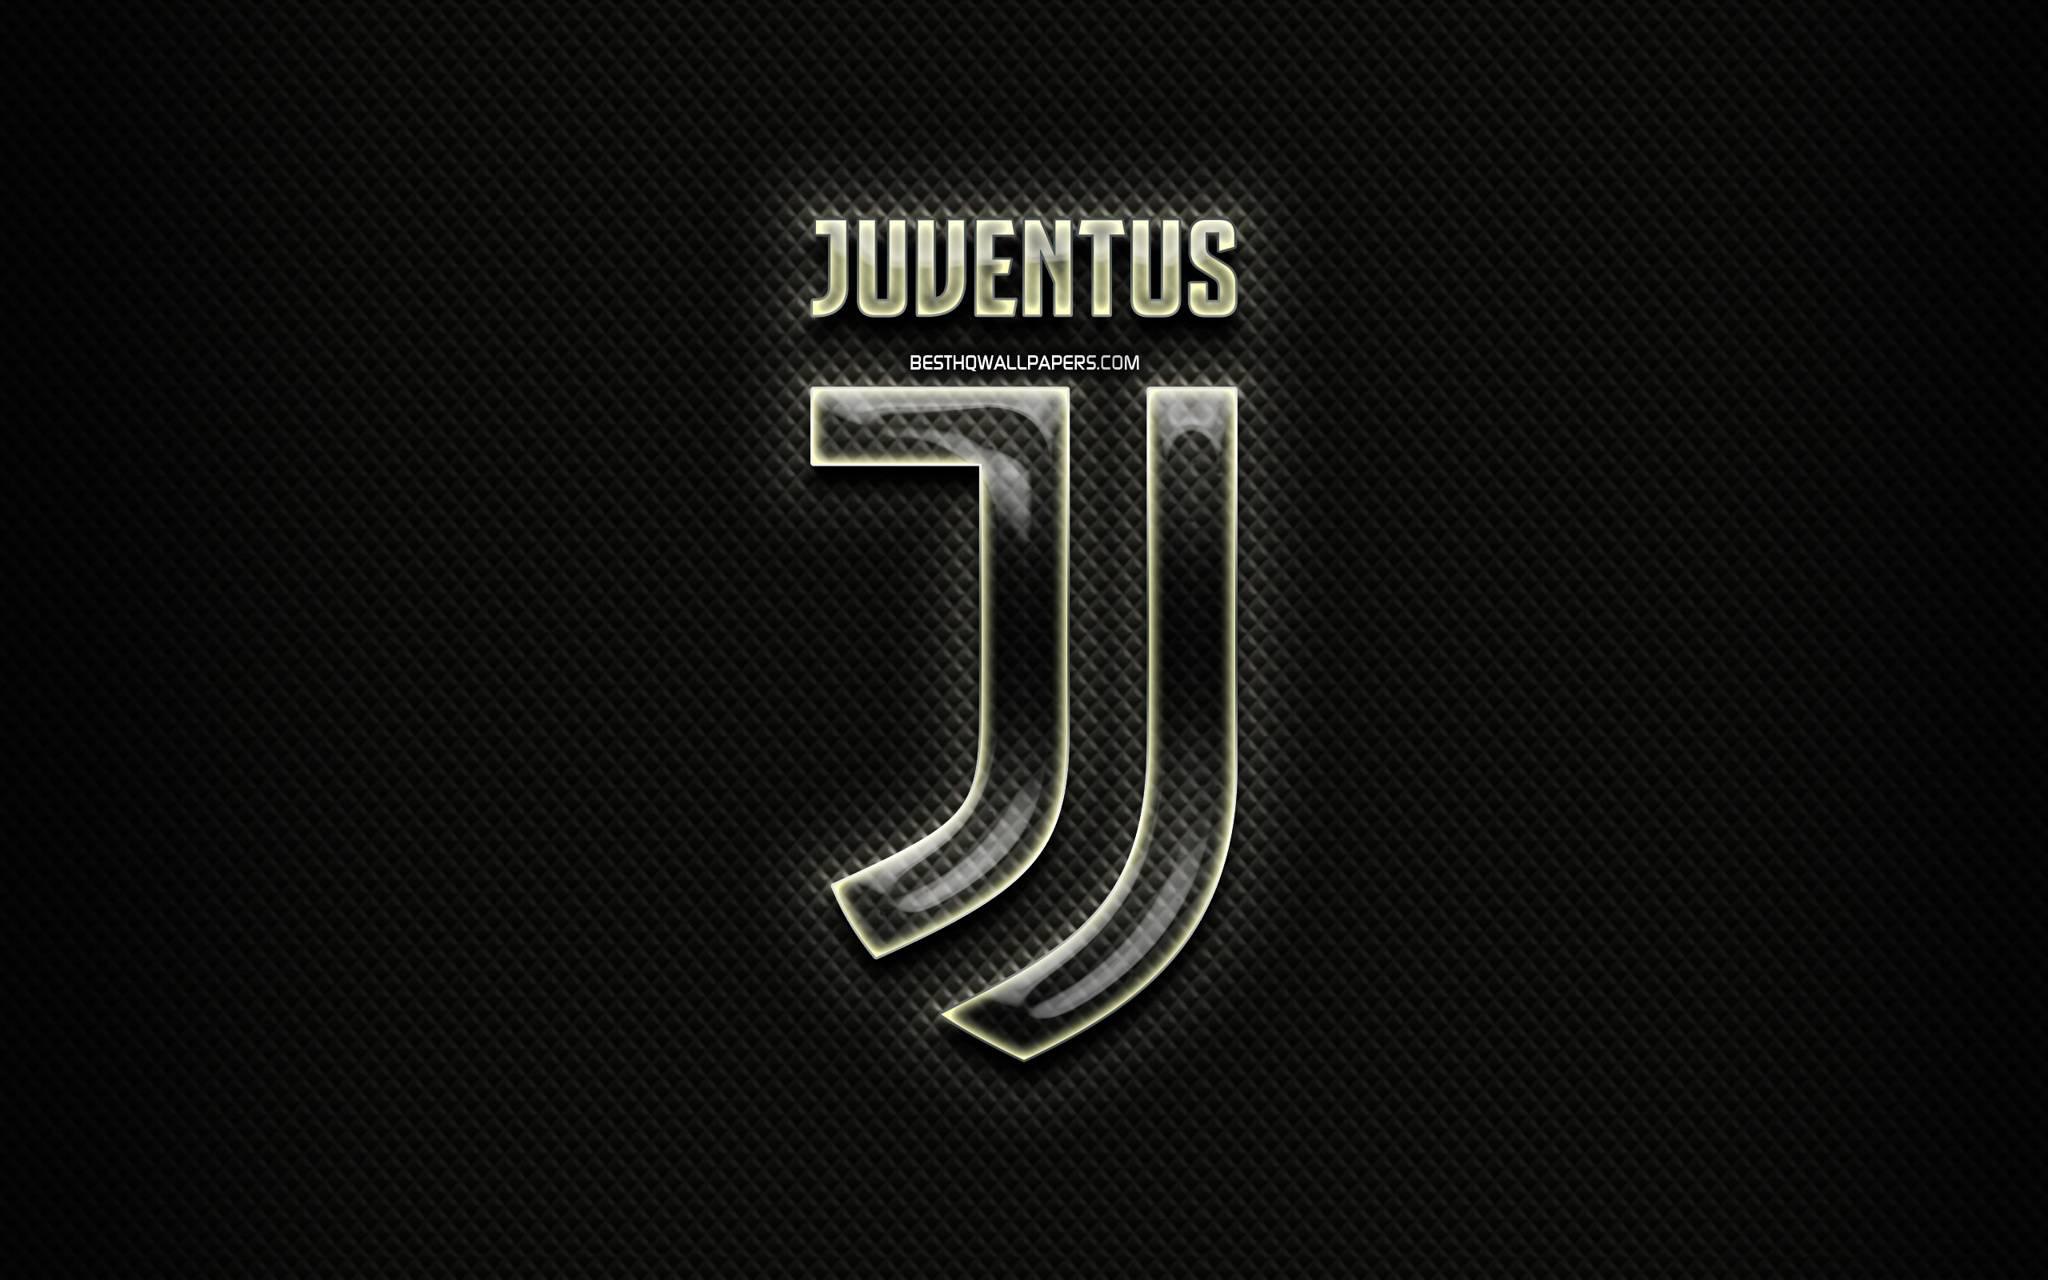 Juventus FC Wallpaper By ElnazTajaddod 58 Free On ZEDGE™